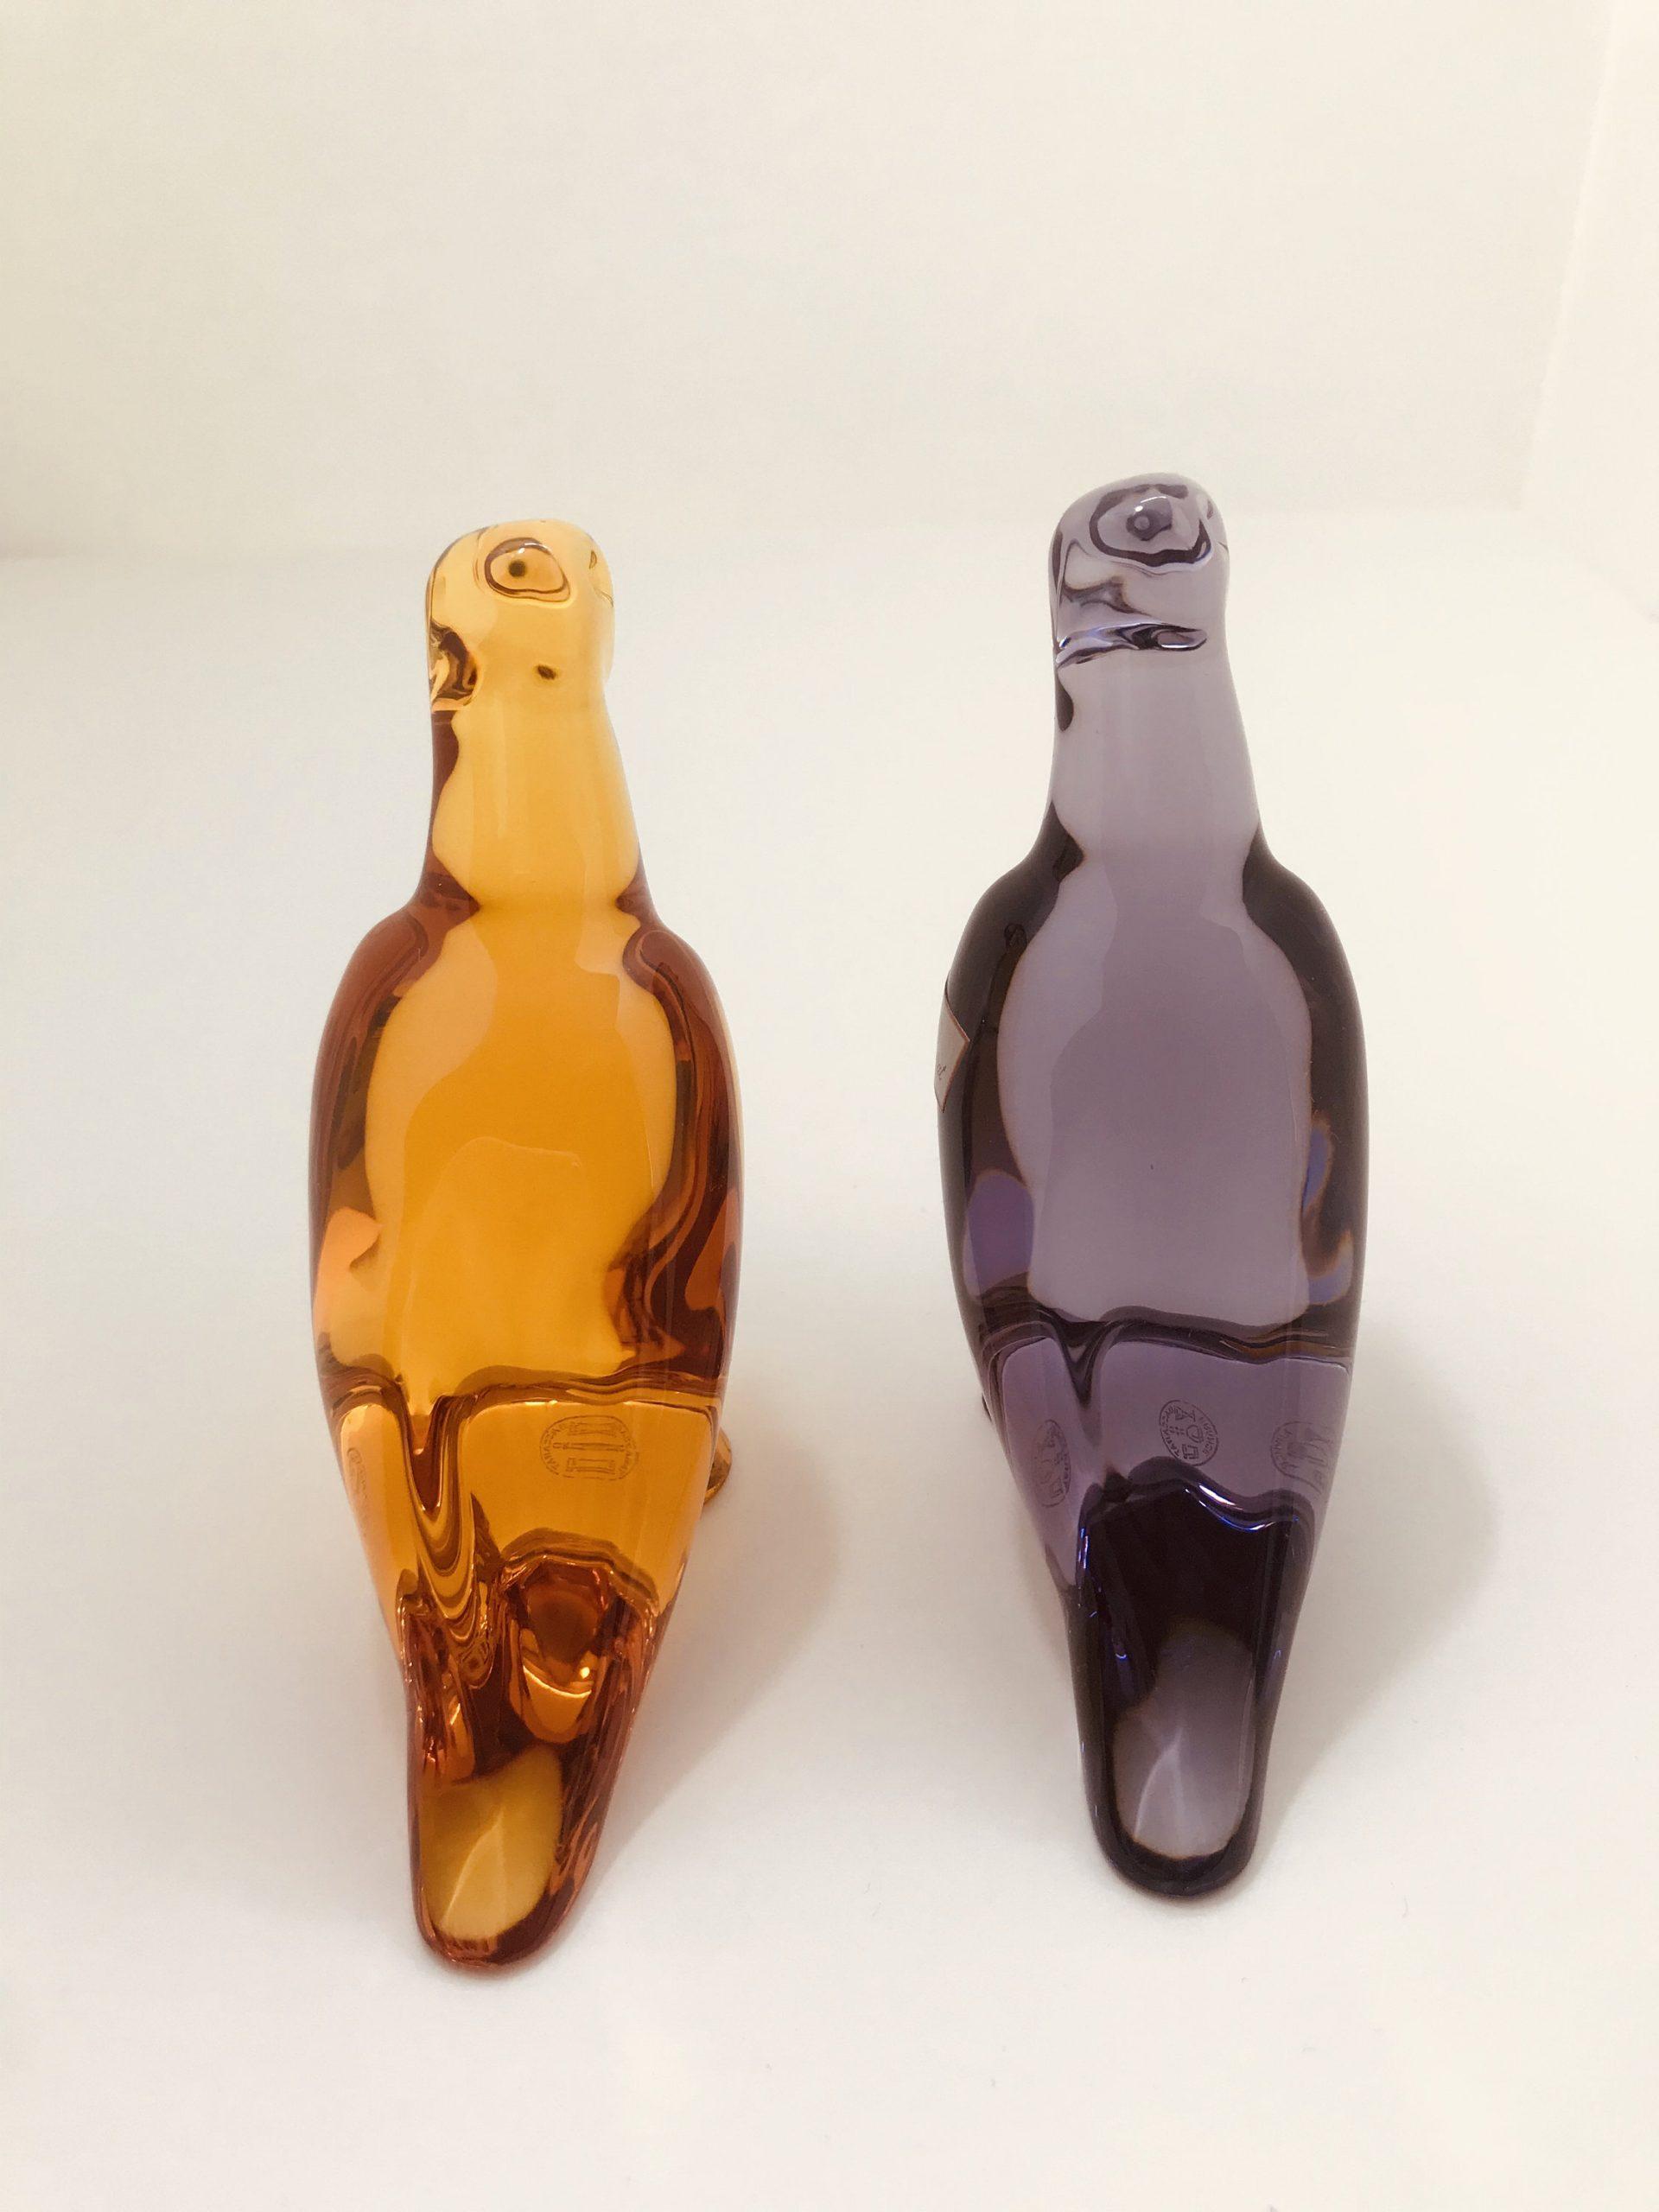 Pair of Baccarat France, Art Glass, Parrot Bird Signed